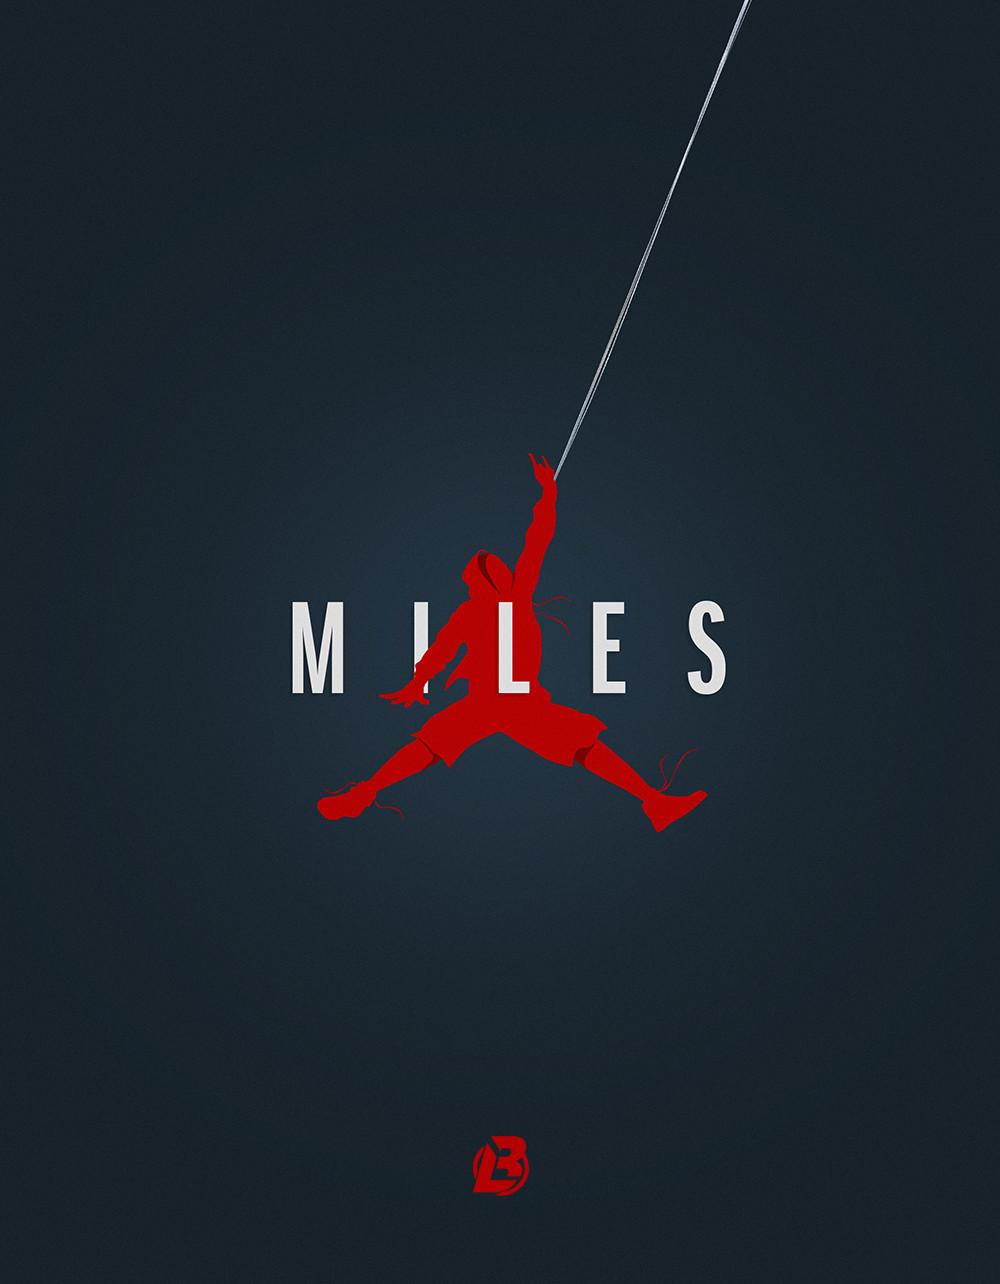 Kode lgx miles 23xx